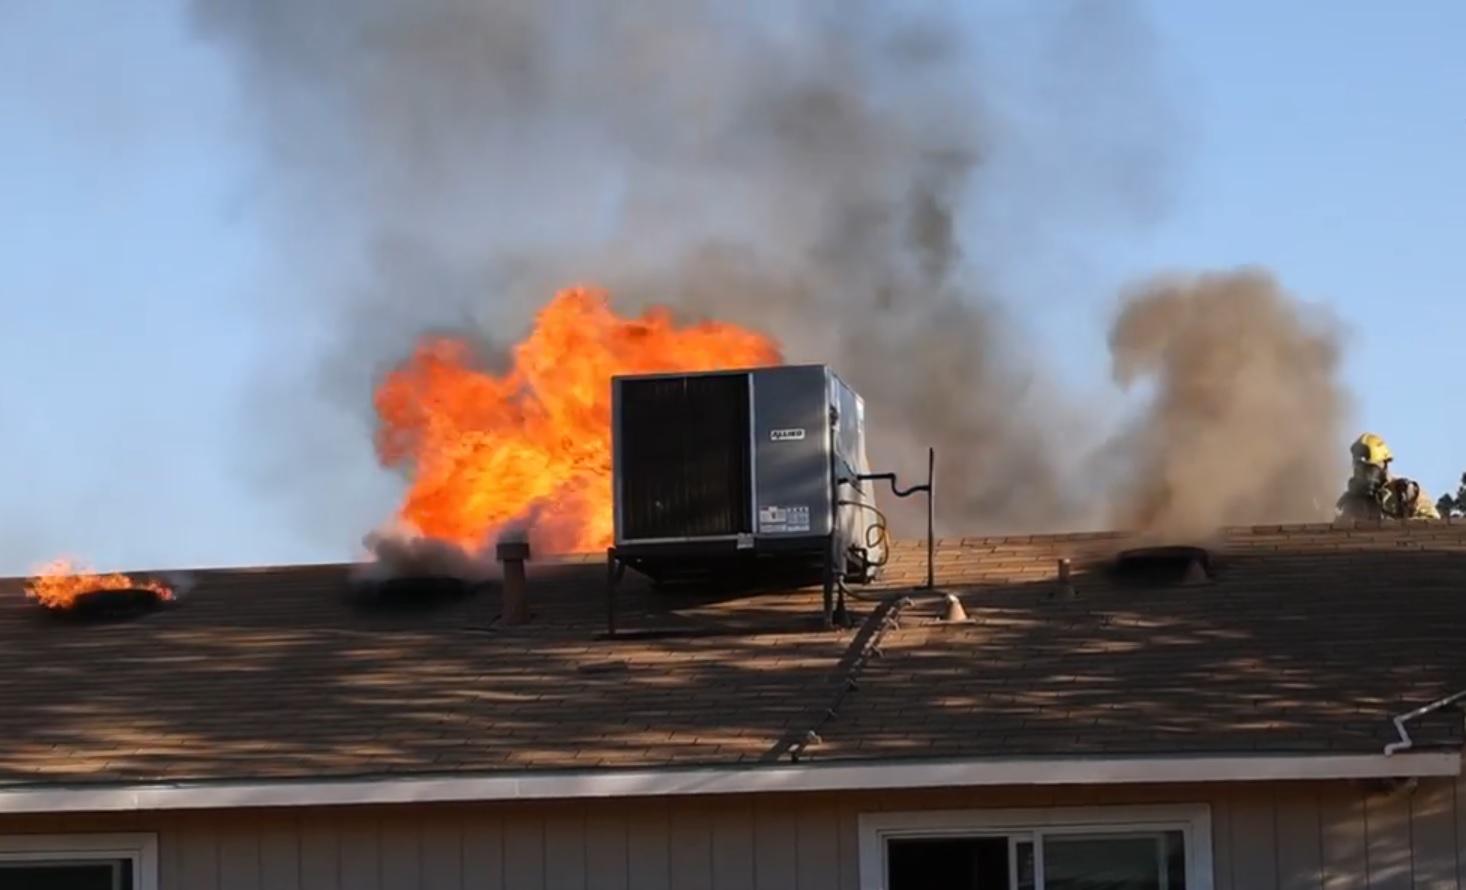 Fire causes $95K worth of damage to Visalia duplex